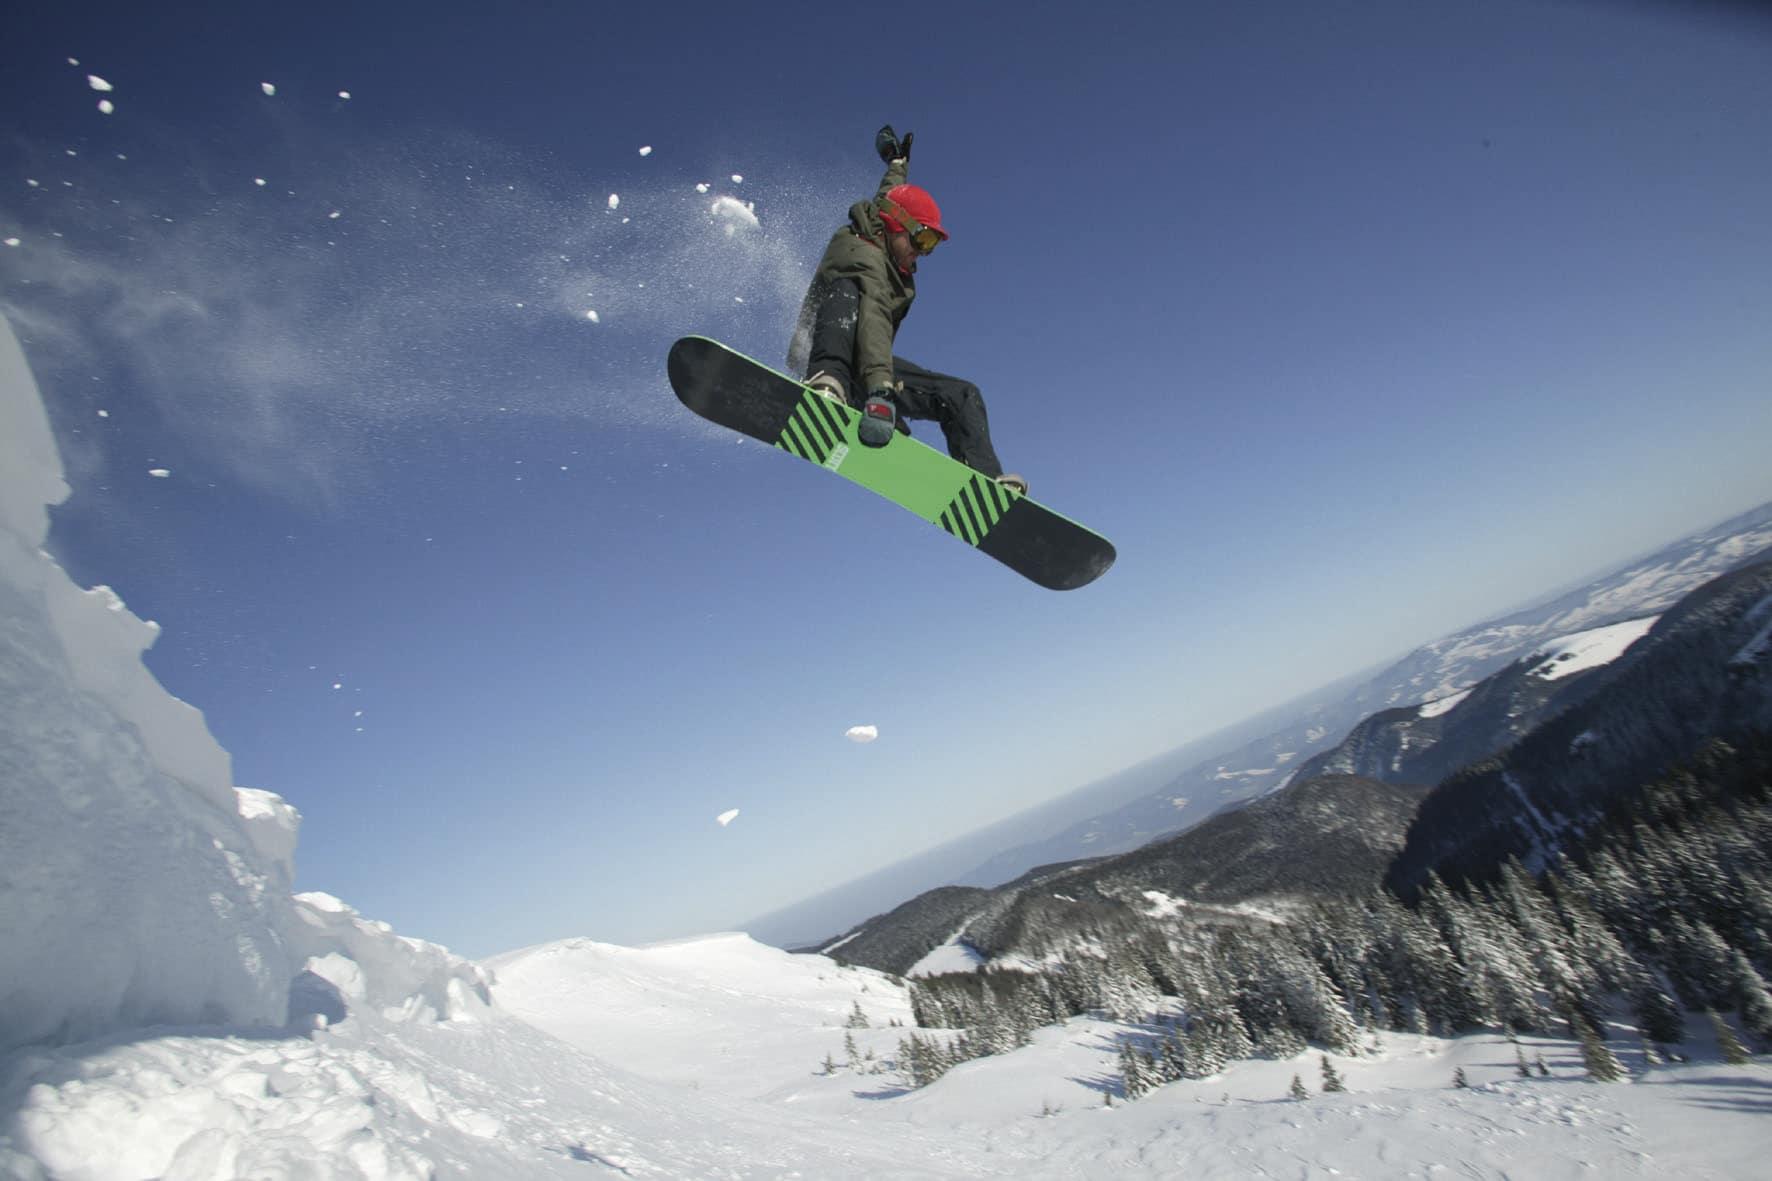 Snowboarder am Feldberg